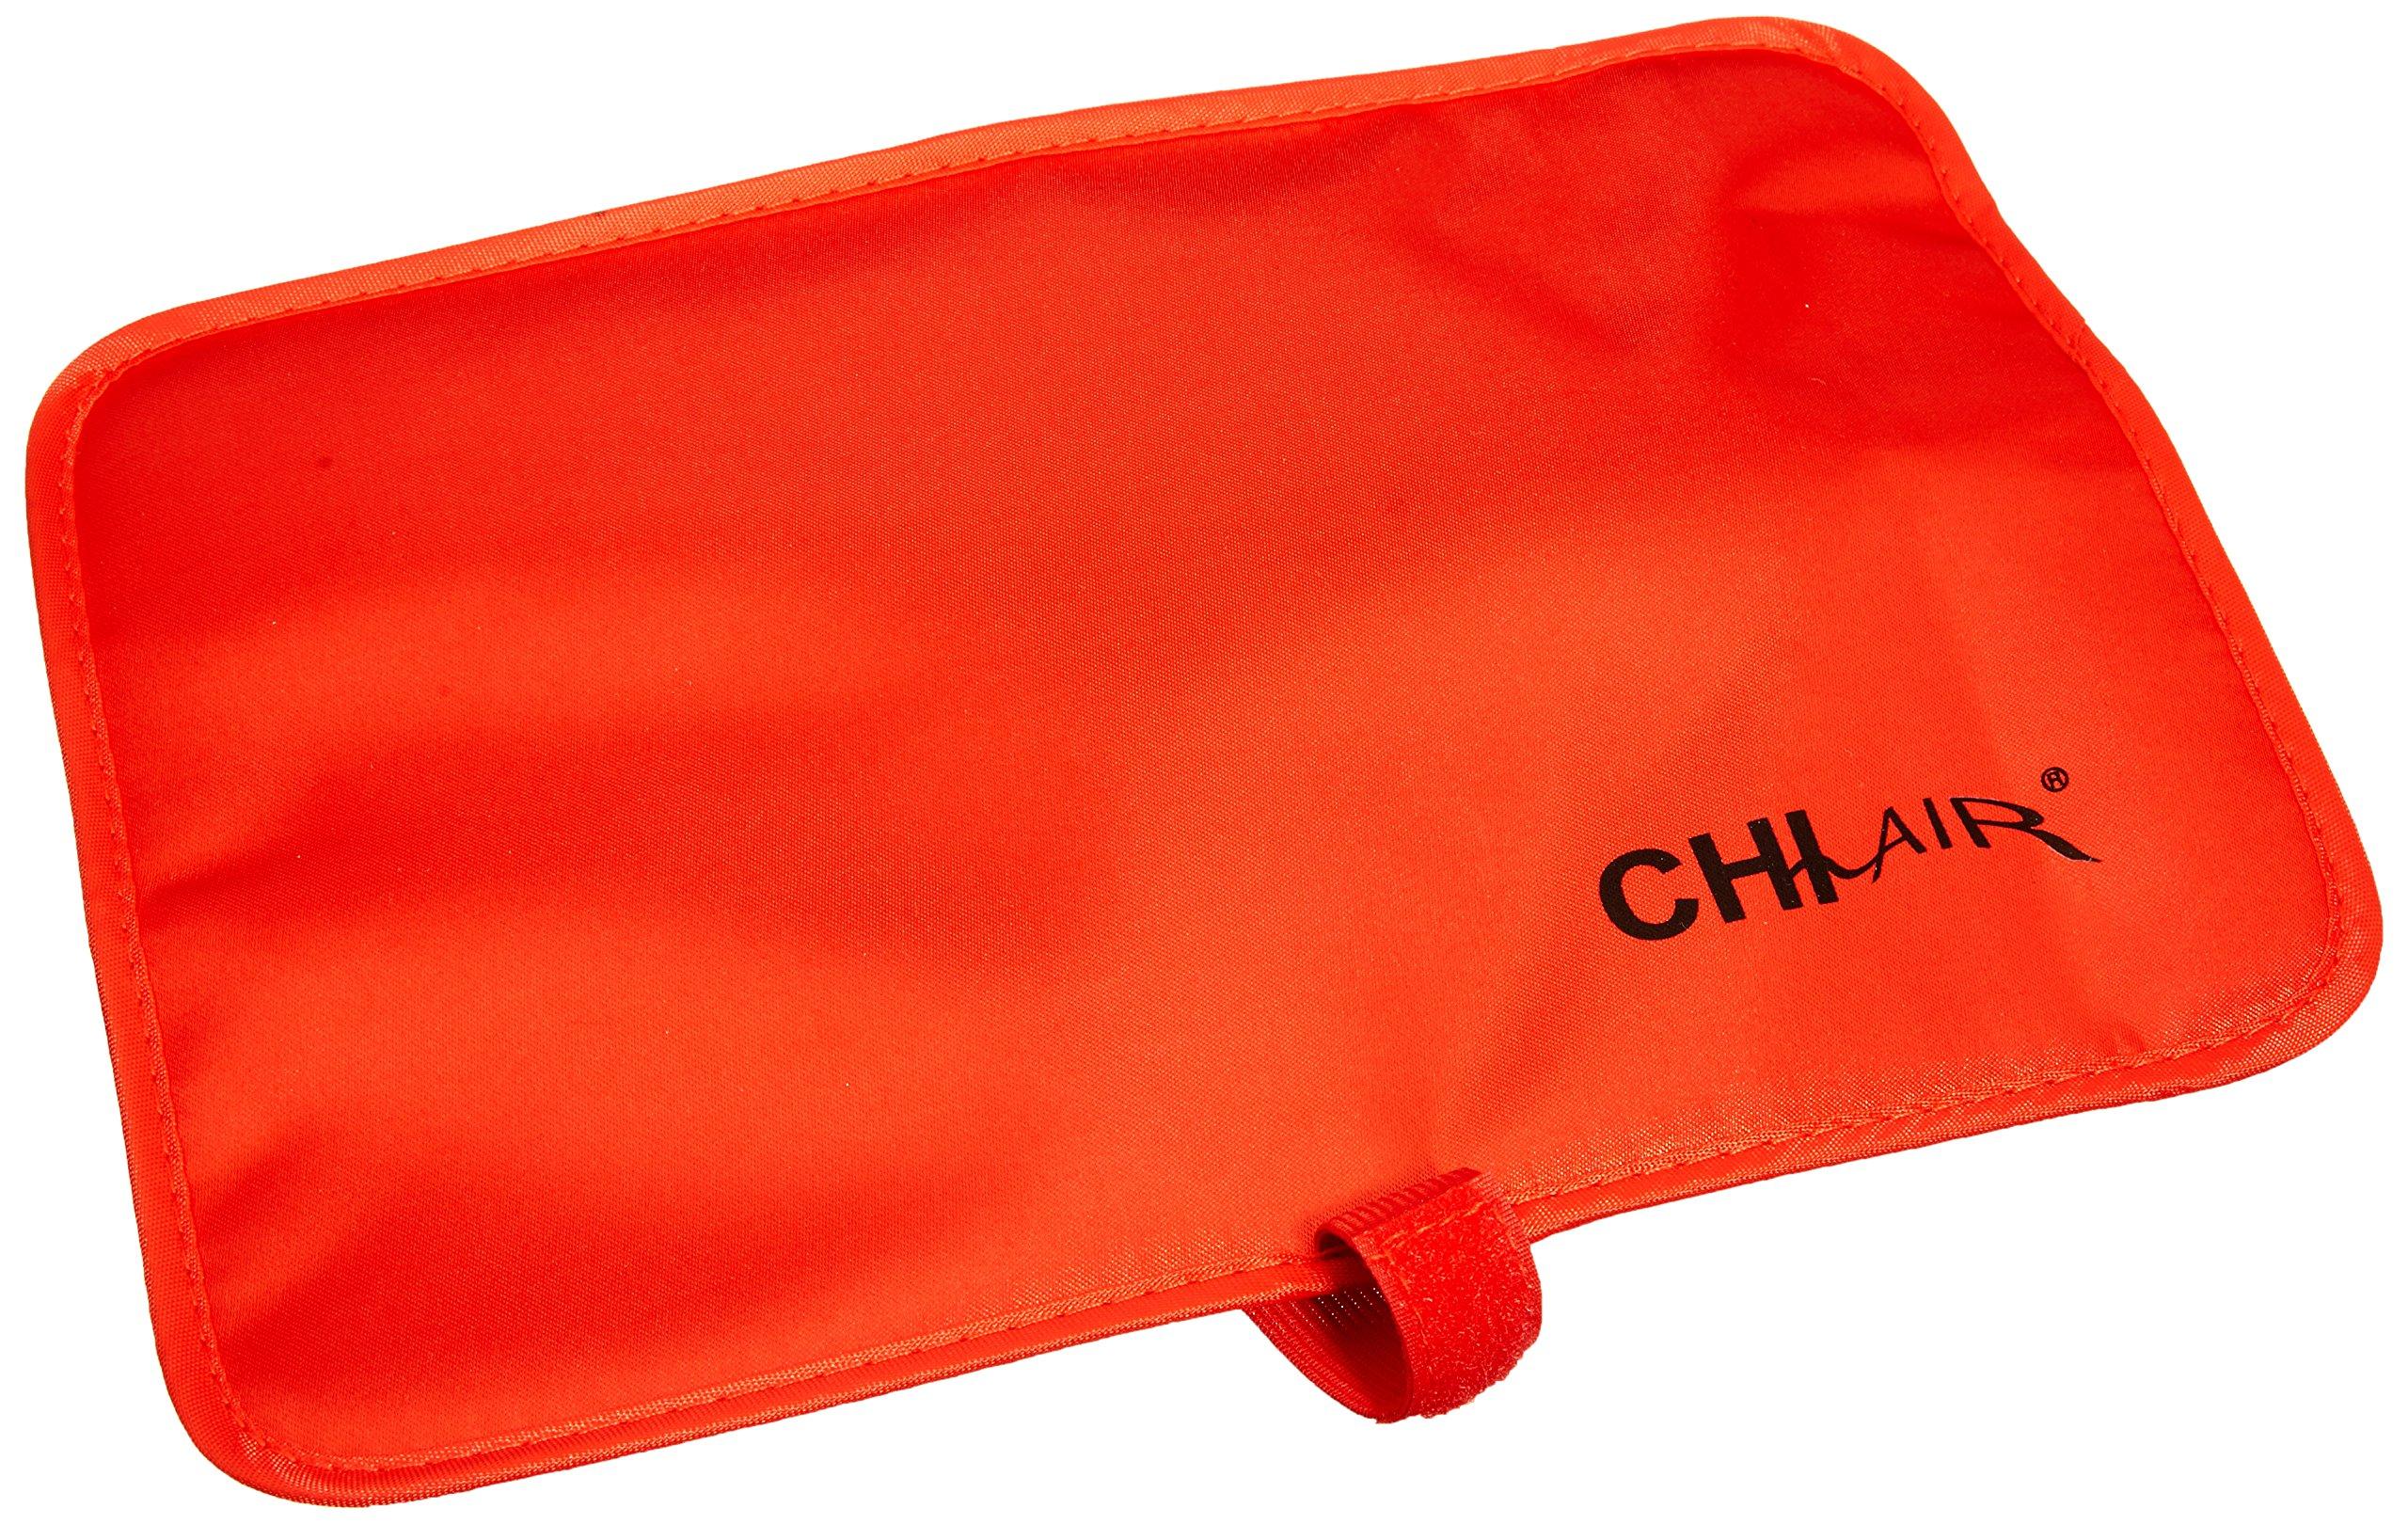 CHI Fire Red Tourmaline Ceramic Flat Iron by CHI (Image #3)